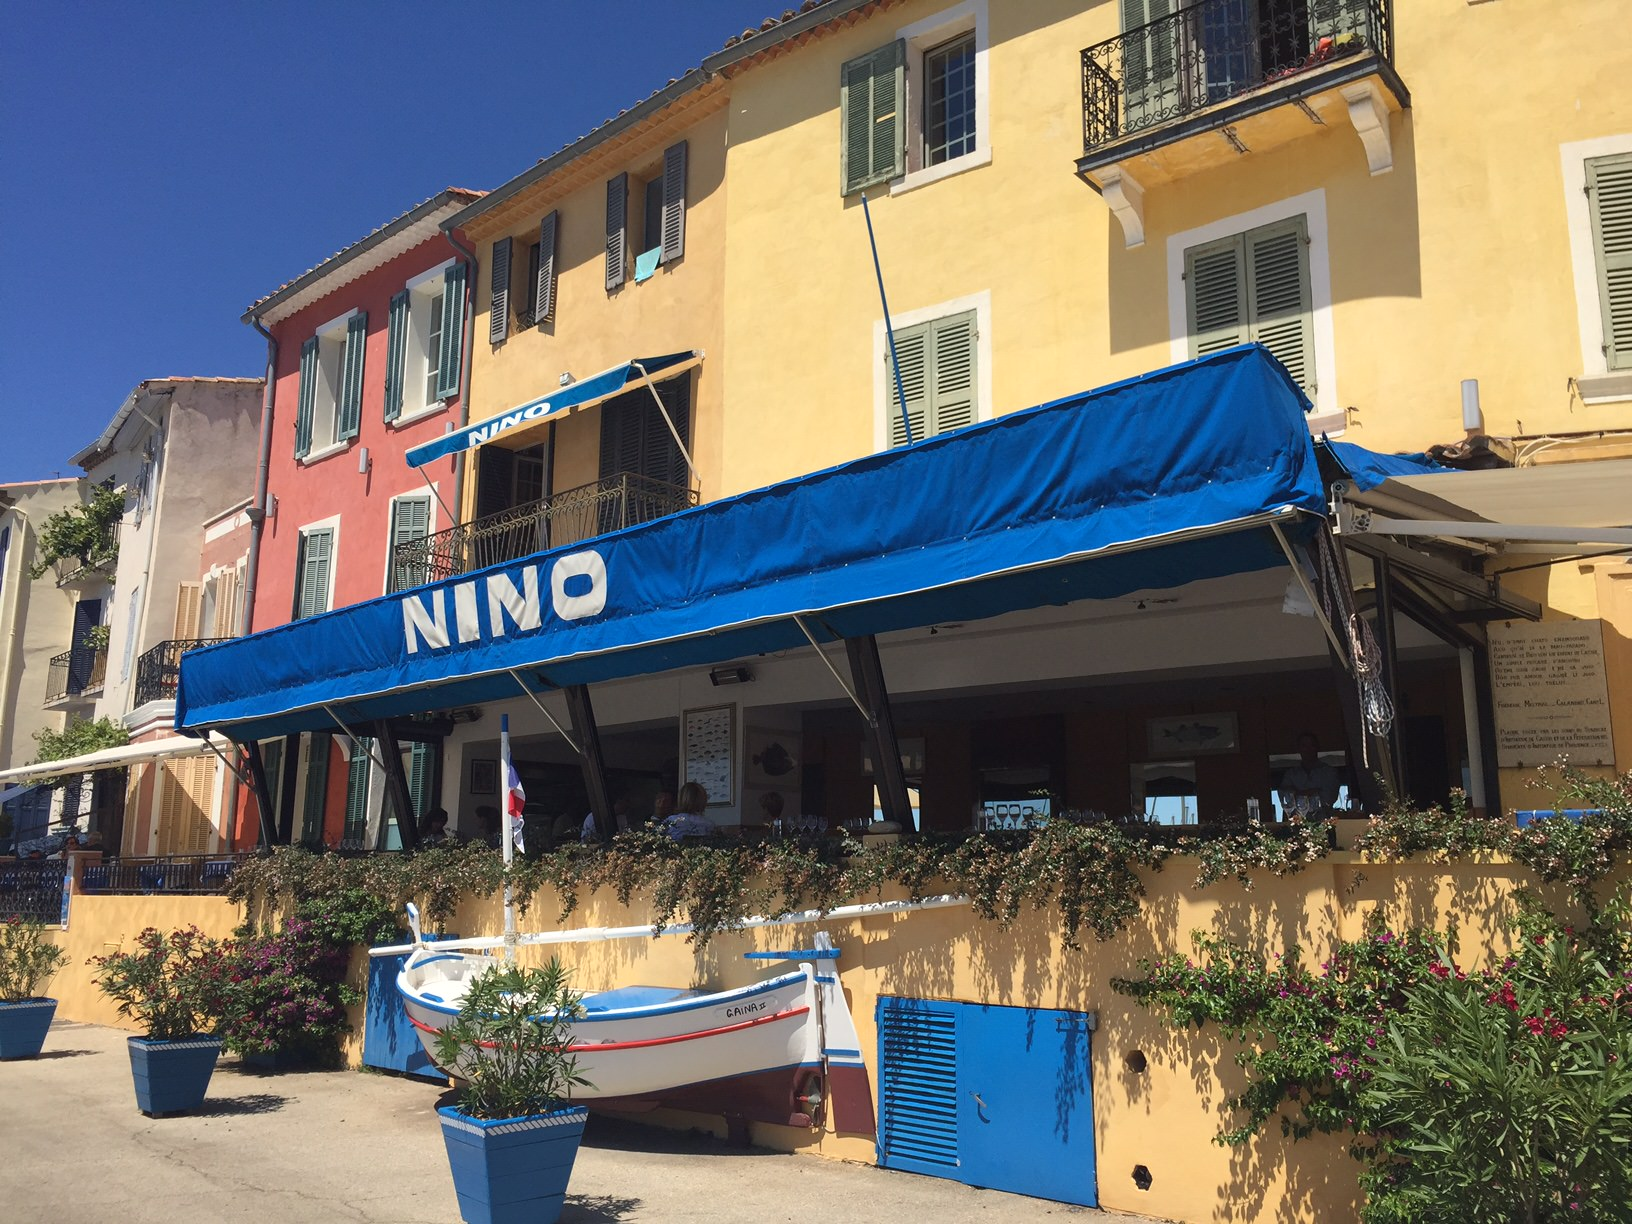 Chez Nino in Cassis